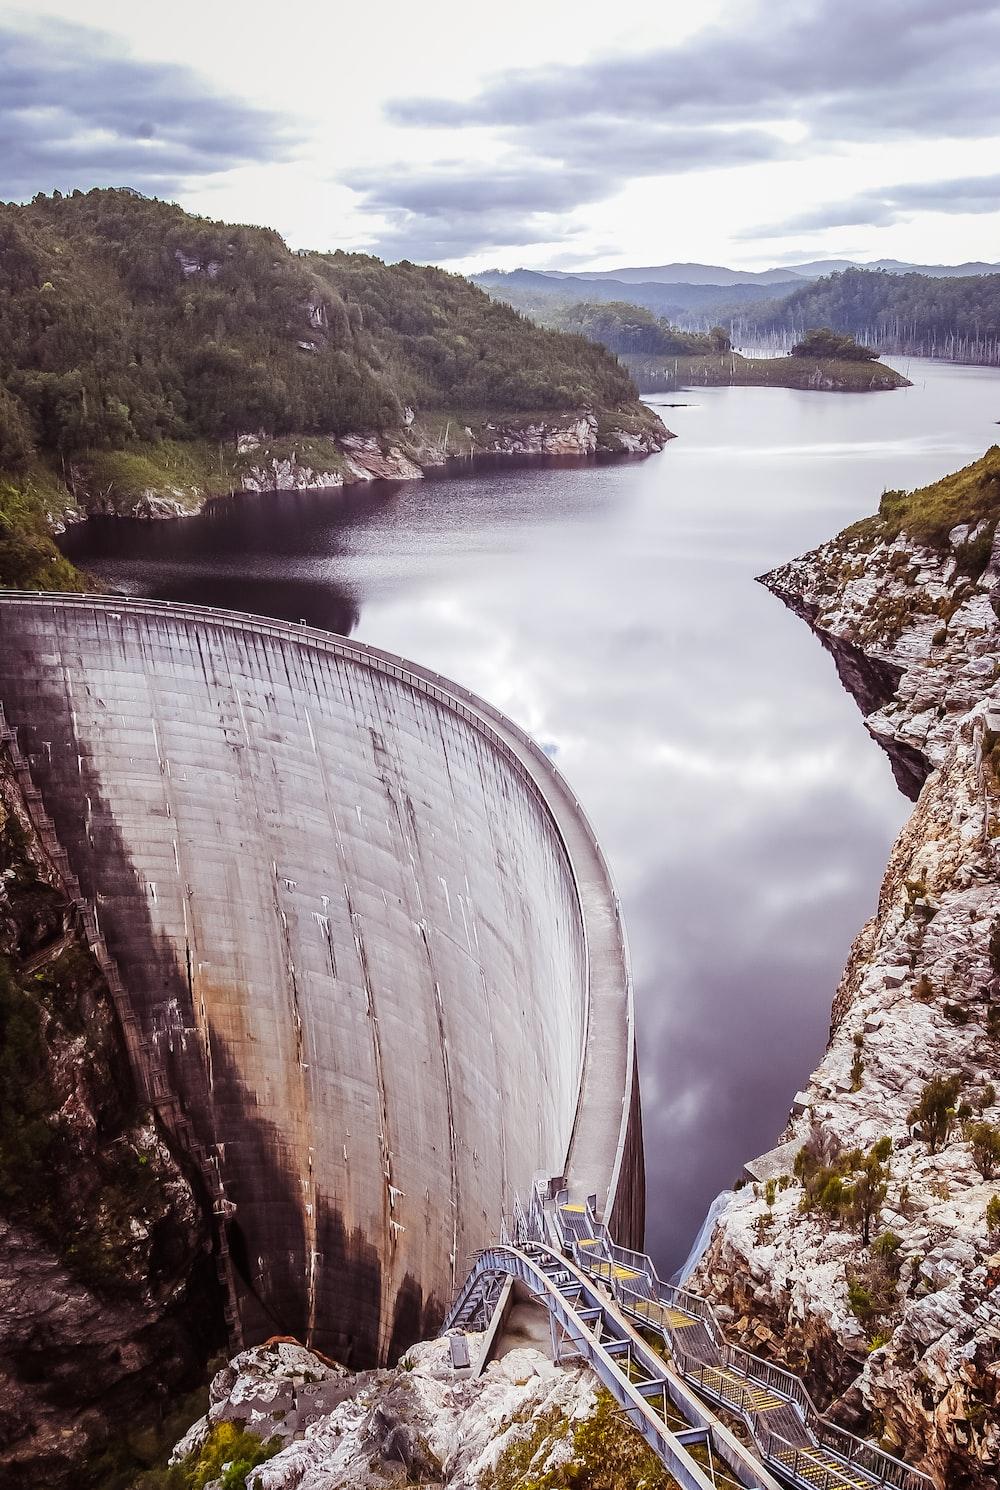 water dam near bridge